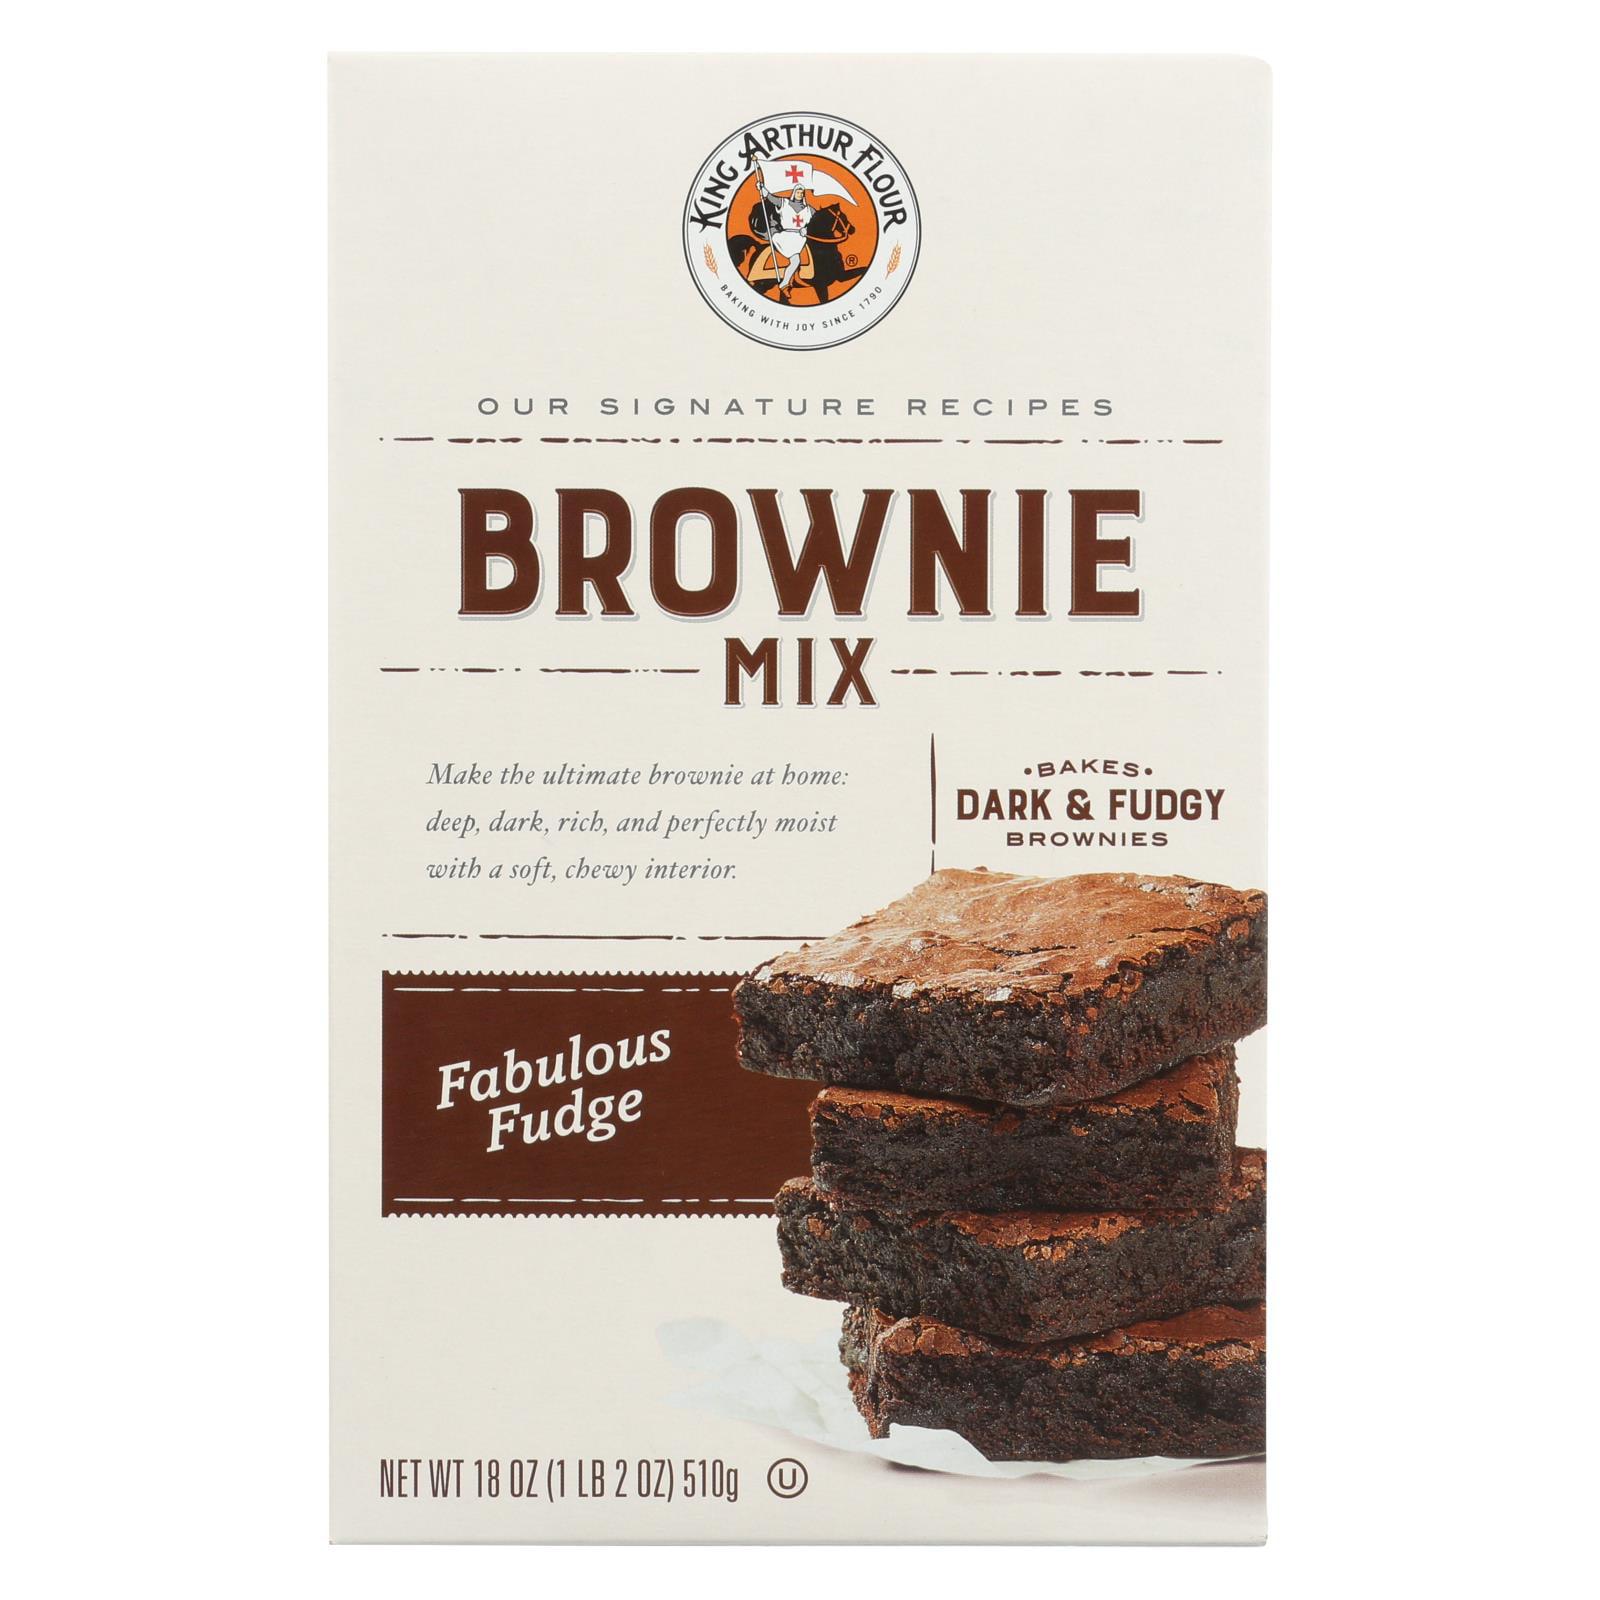 King Arthur Mix Fudge Brownie 18 OZ (Pack of 6)